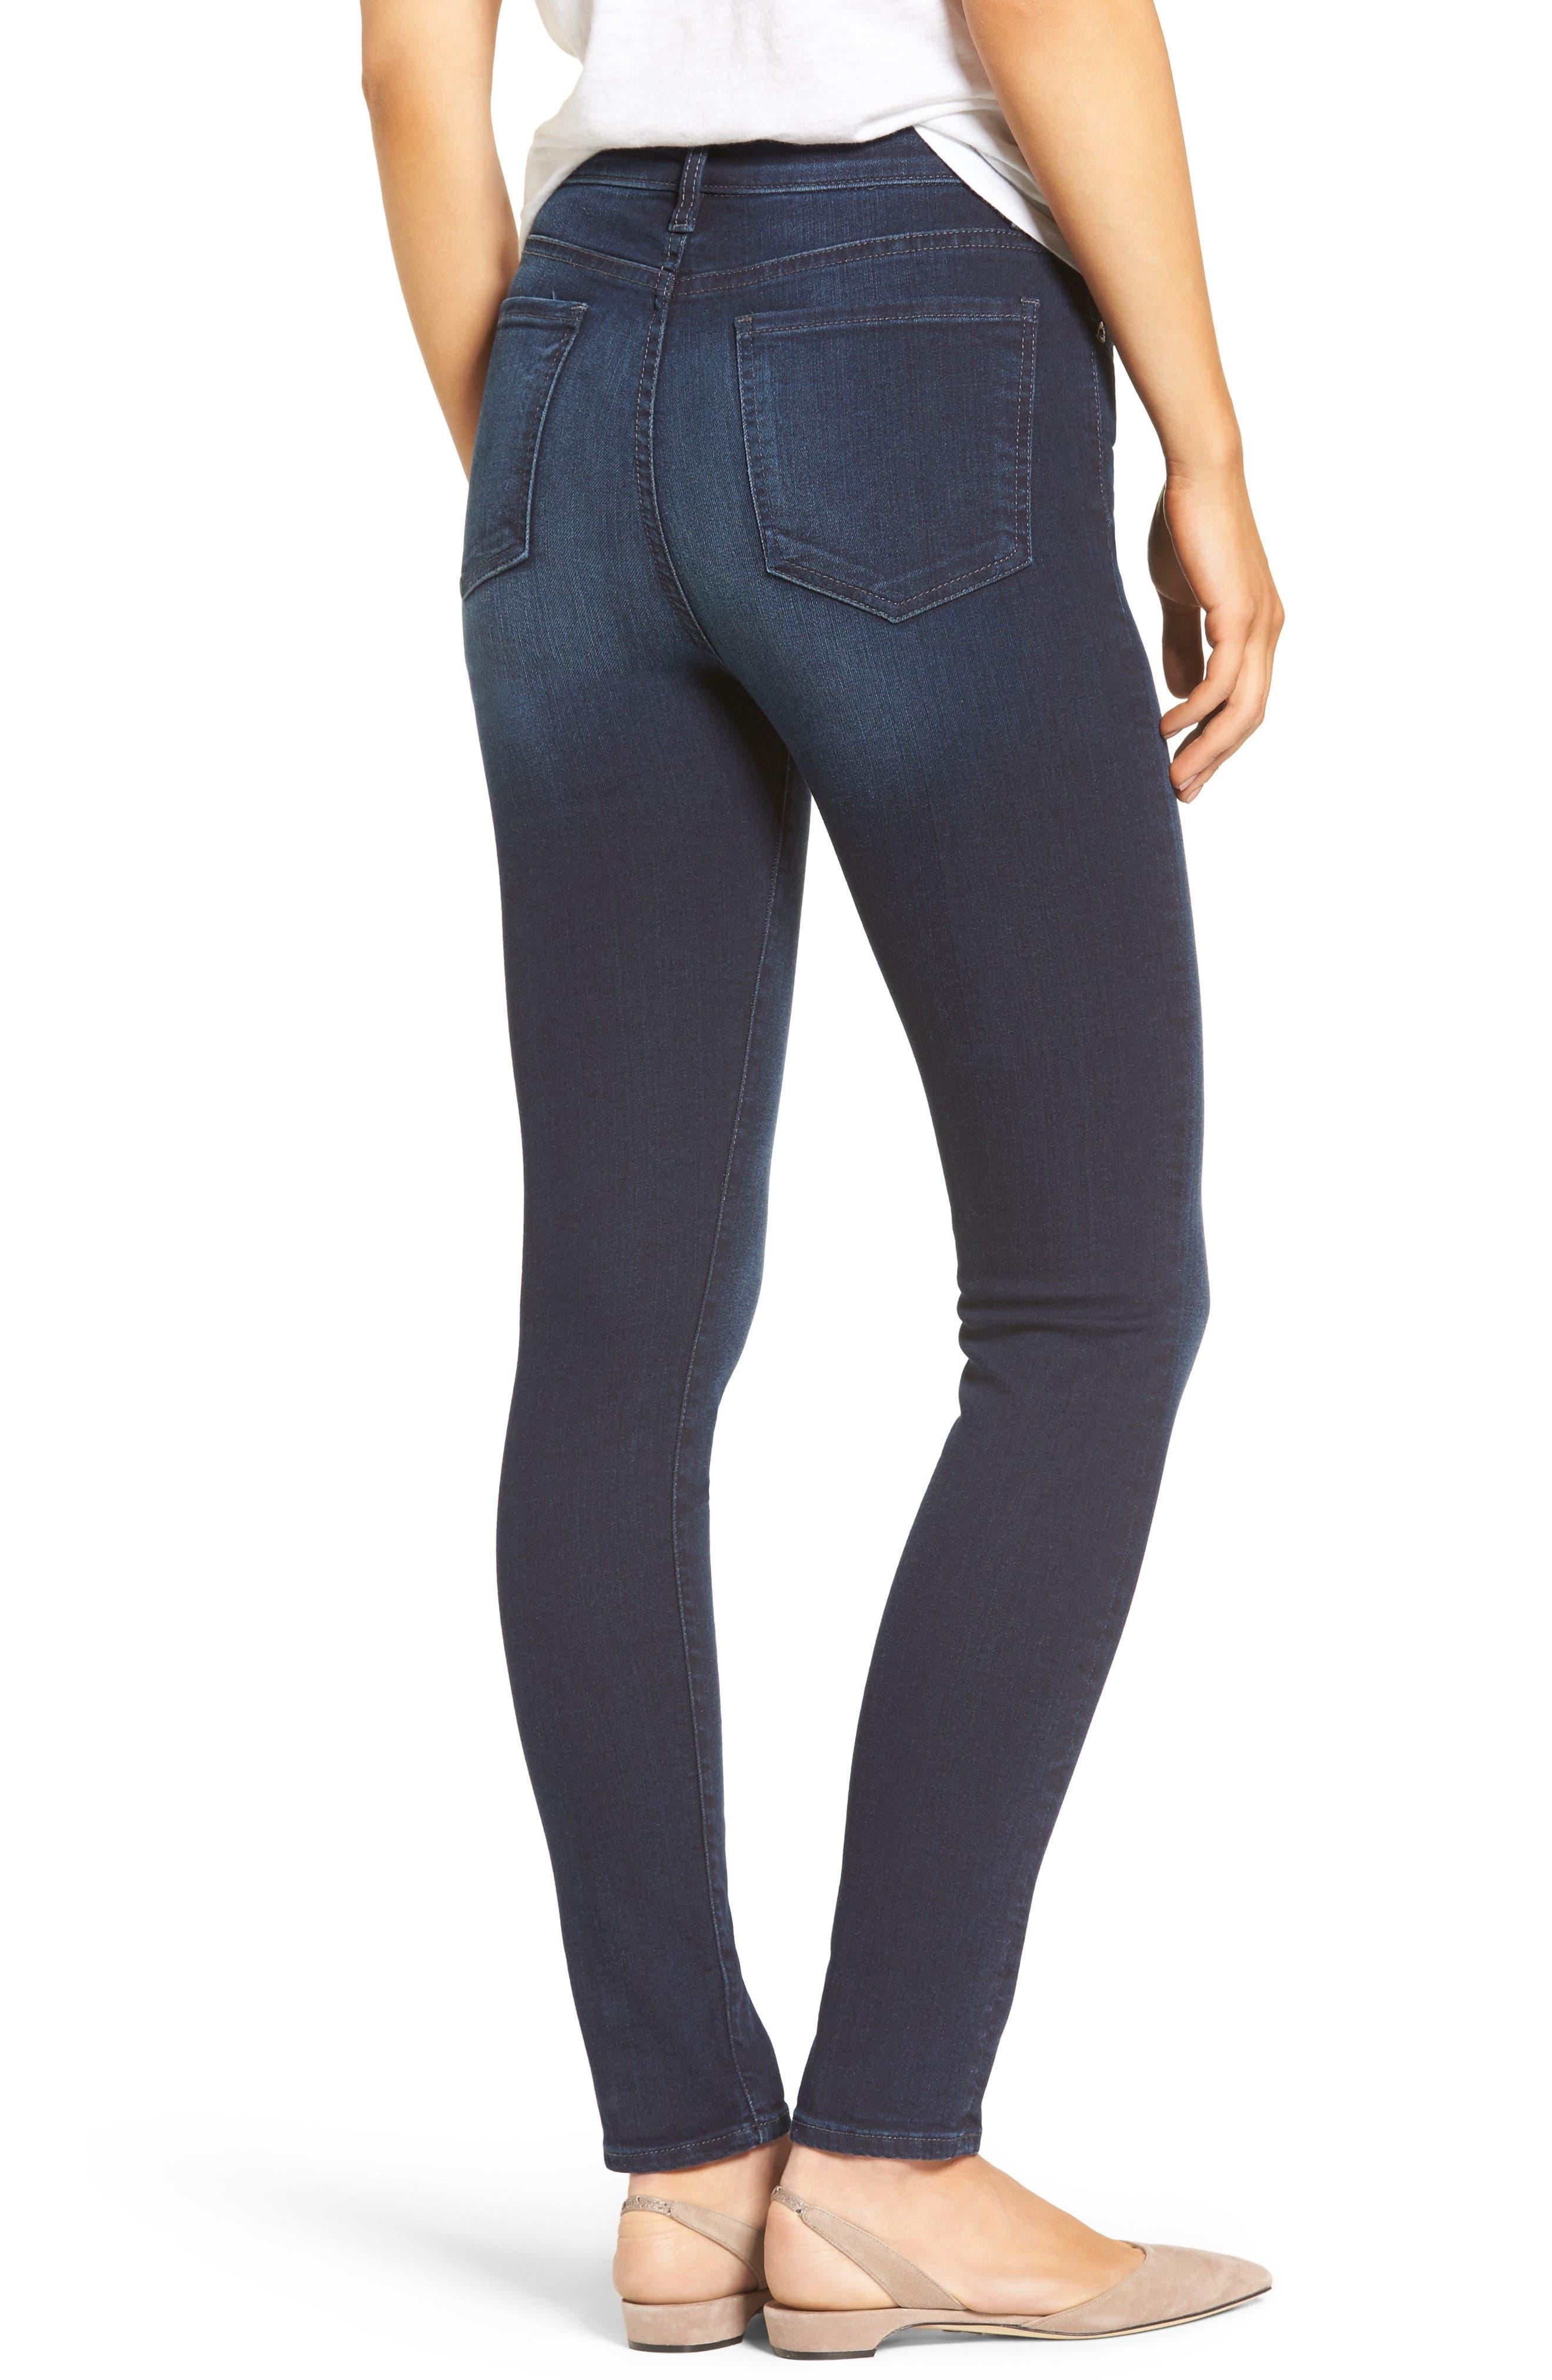 Alternate Image 2  - KUT from the Kloth Mia High Waist Skinny Jeans (Regular & Petite) (Pacable)